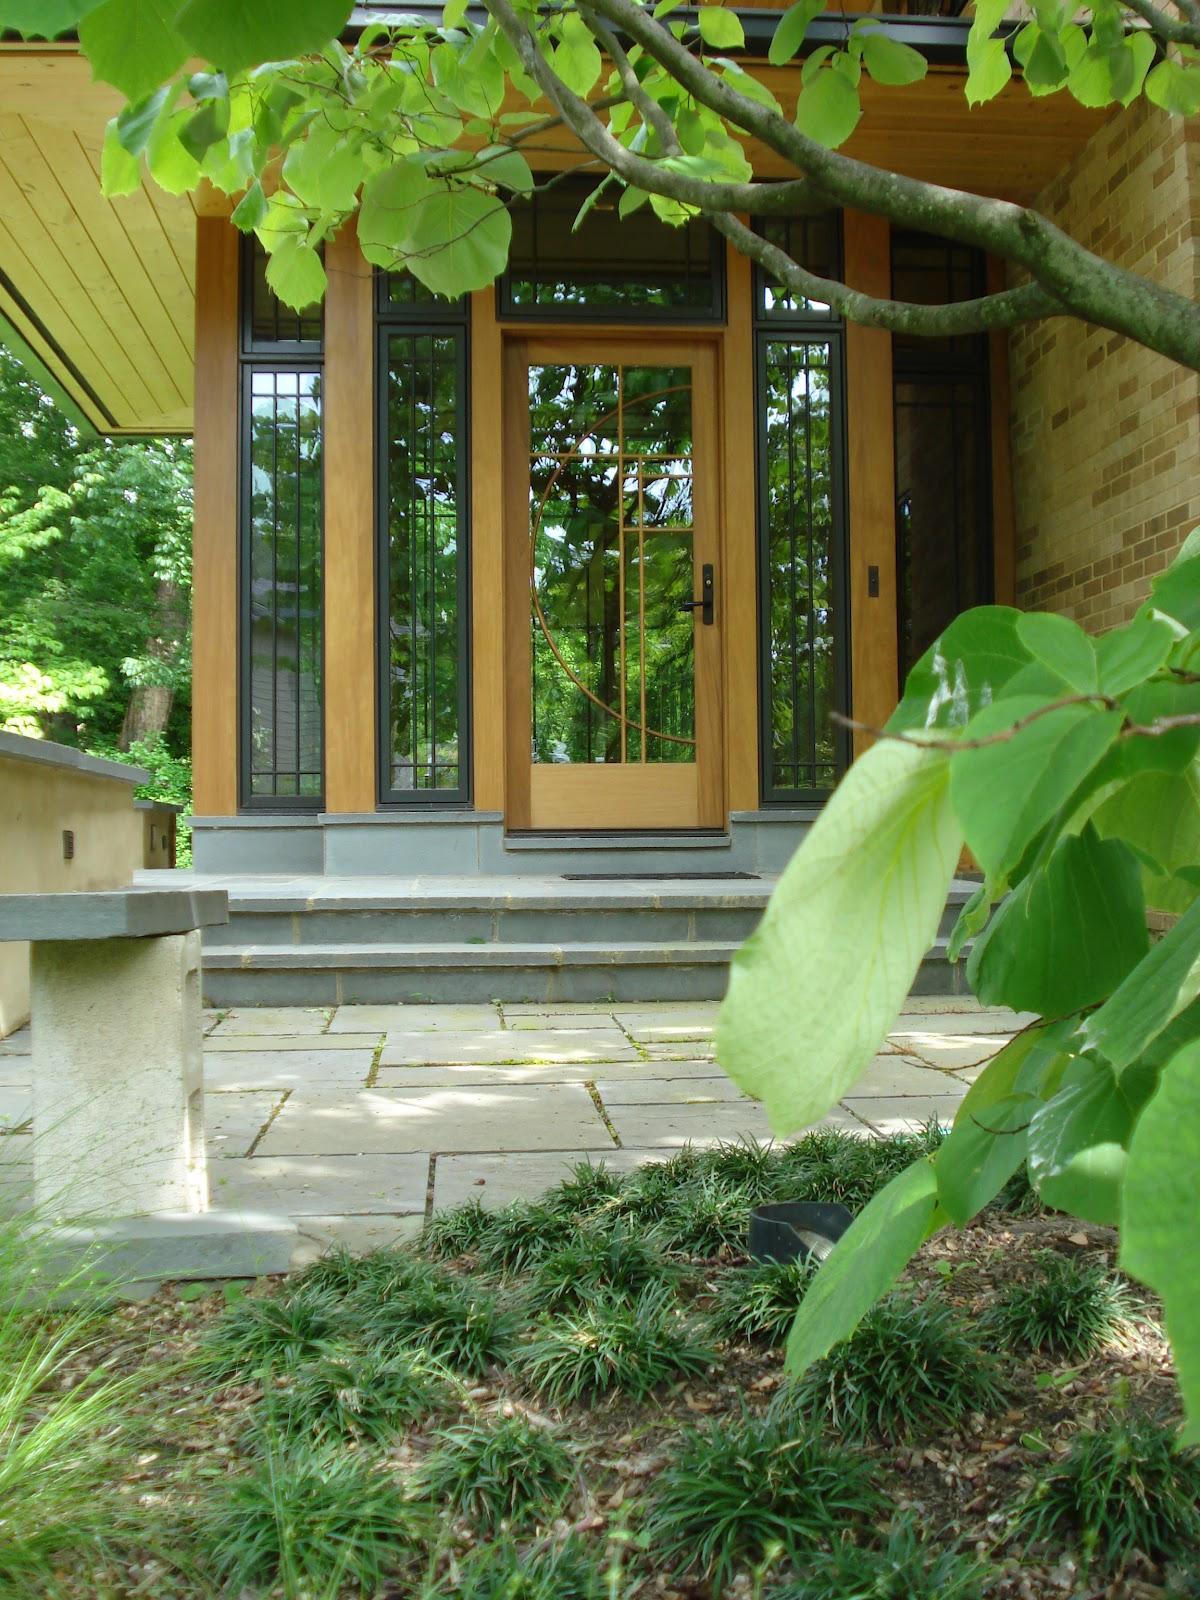 Maffei Landscape Design Maffei Creates Landscapes